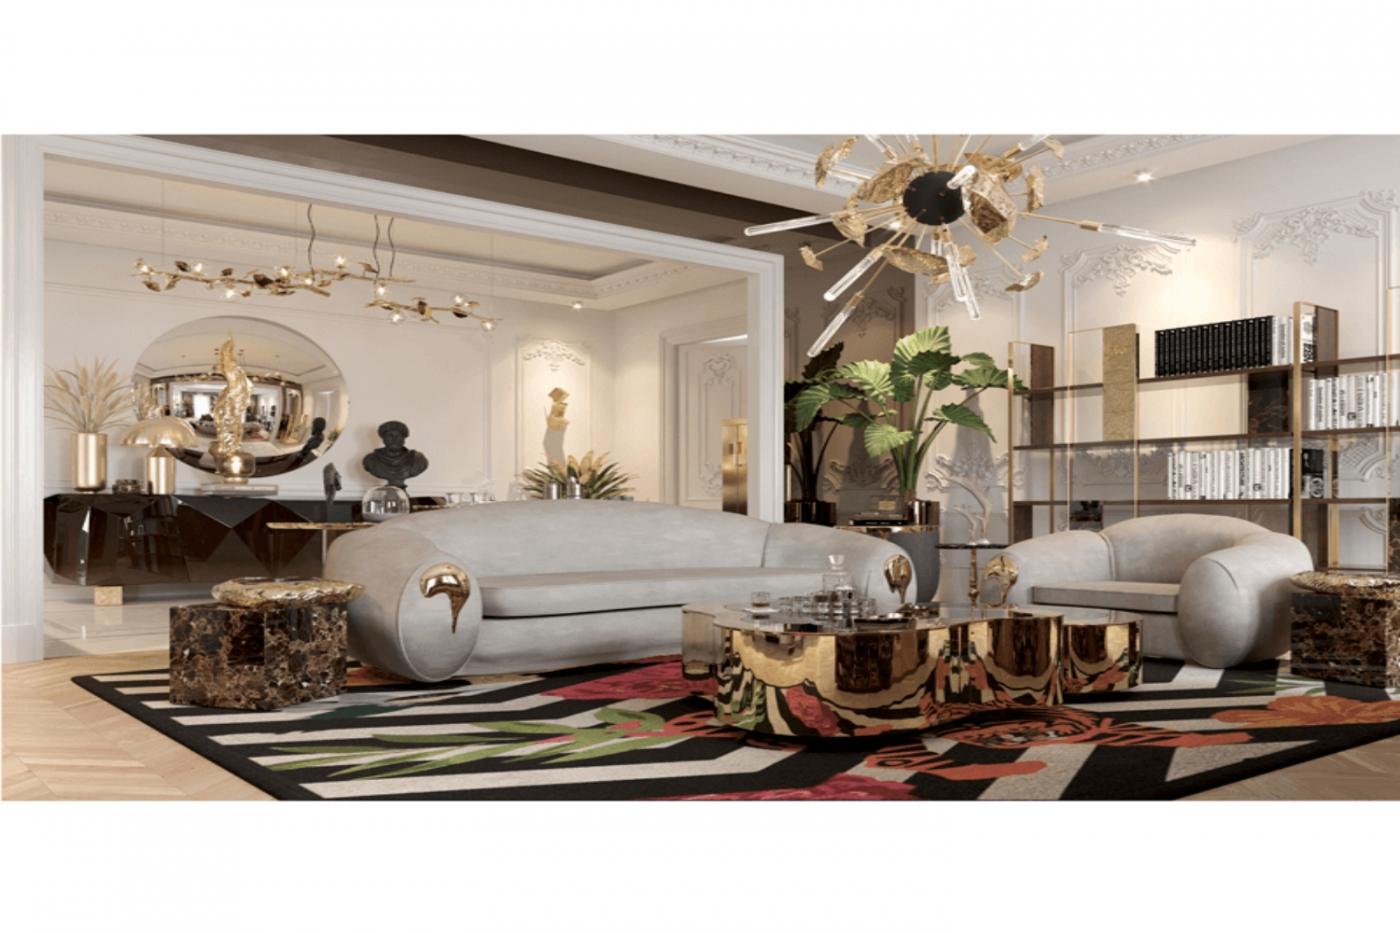 luxury furniture luxury furniture 6 Luxury Furniture Pieces Perfect For Dubai's Lifestyle stonehenge side table 04 boca do lobo 1 1 1400x933